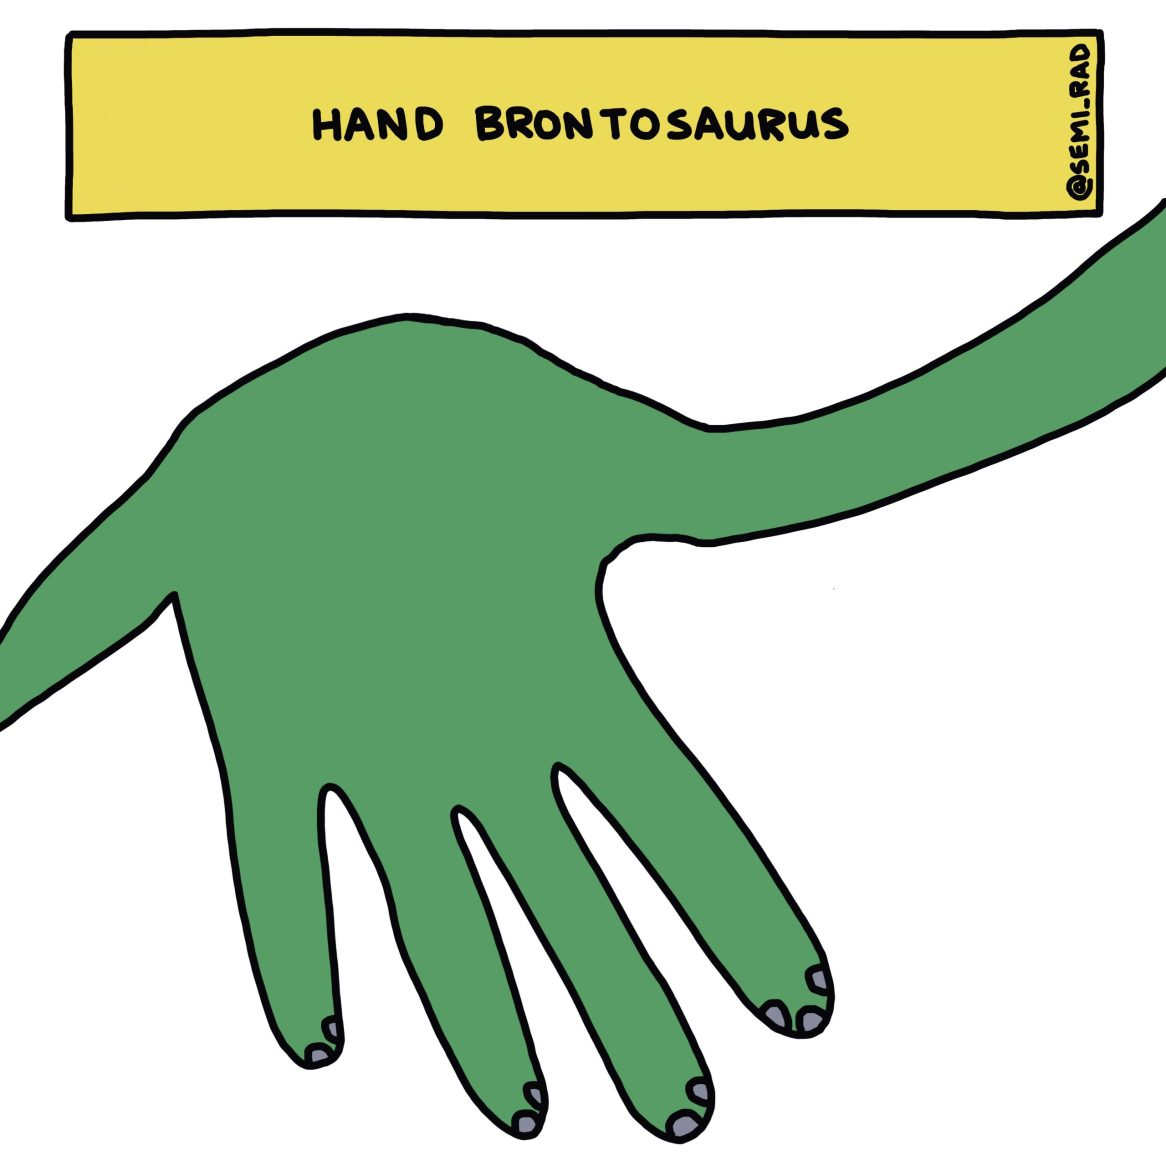 semi-rad hand brontosaurus